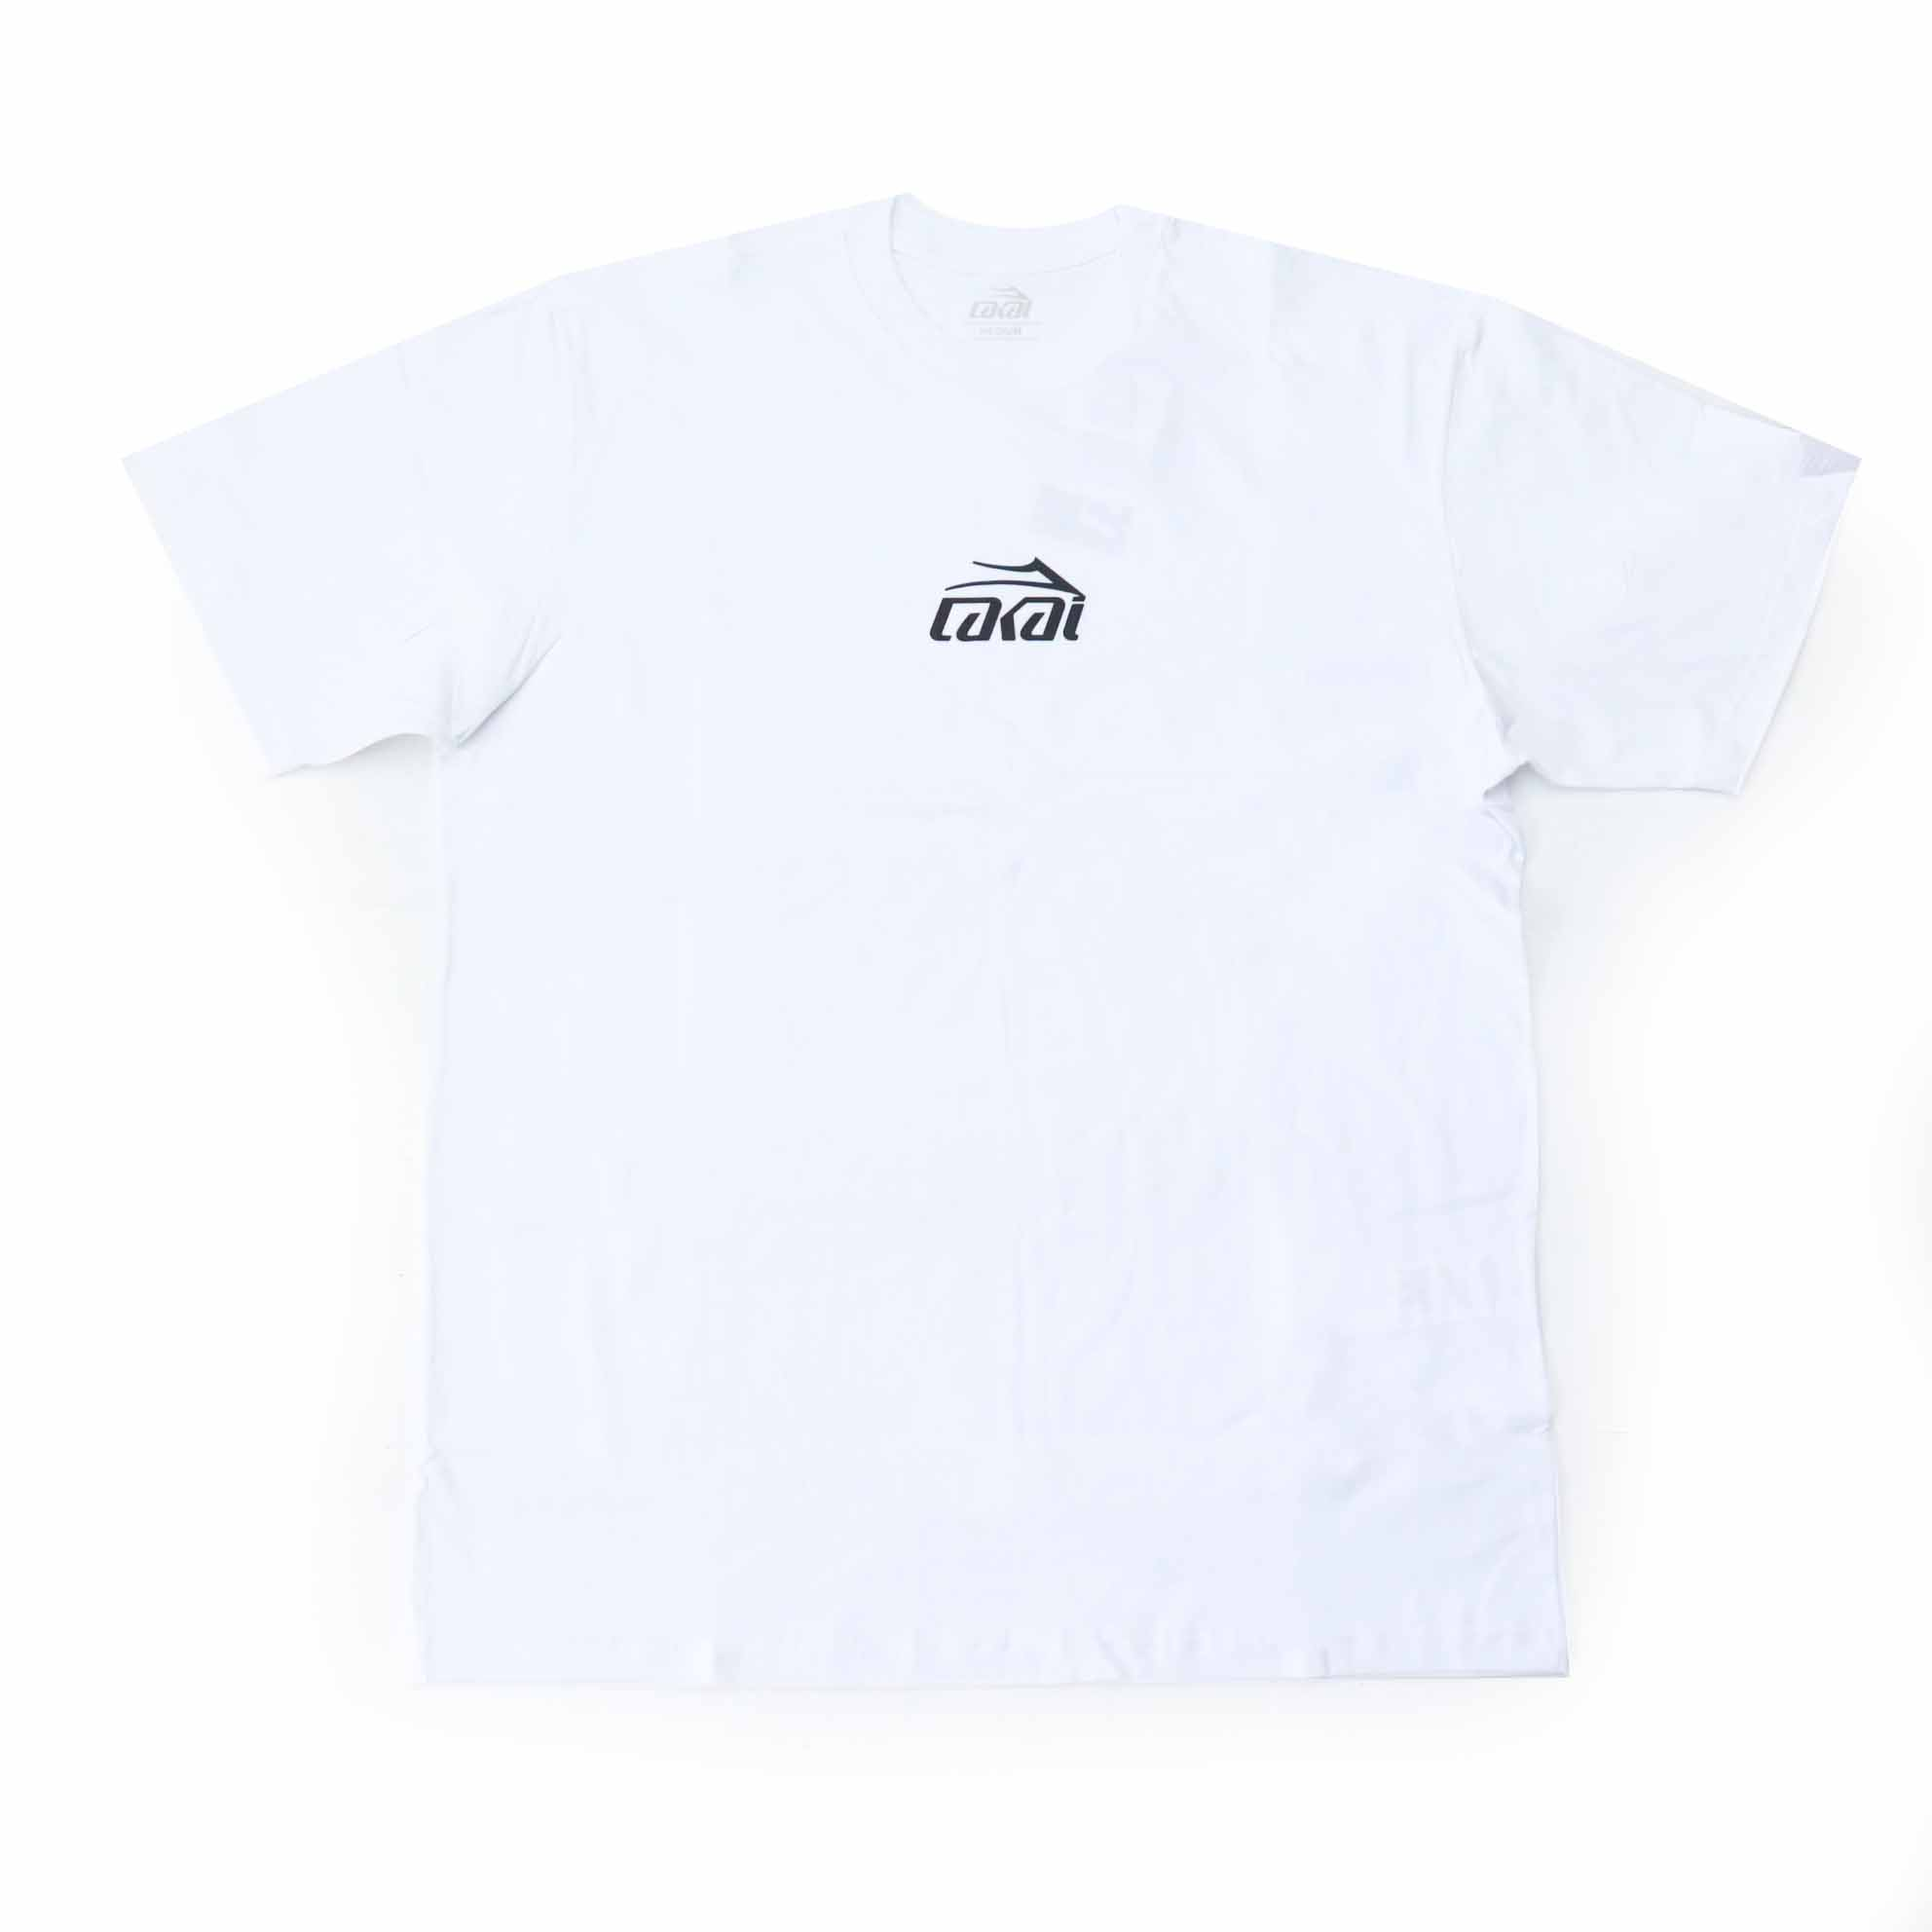 Camiseta Lakai Basic Sintetic - Branco